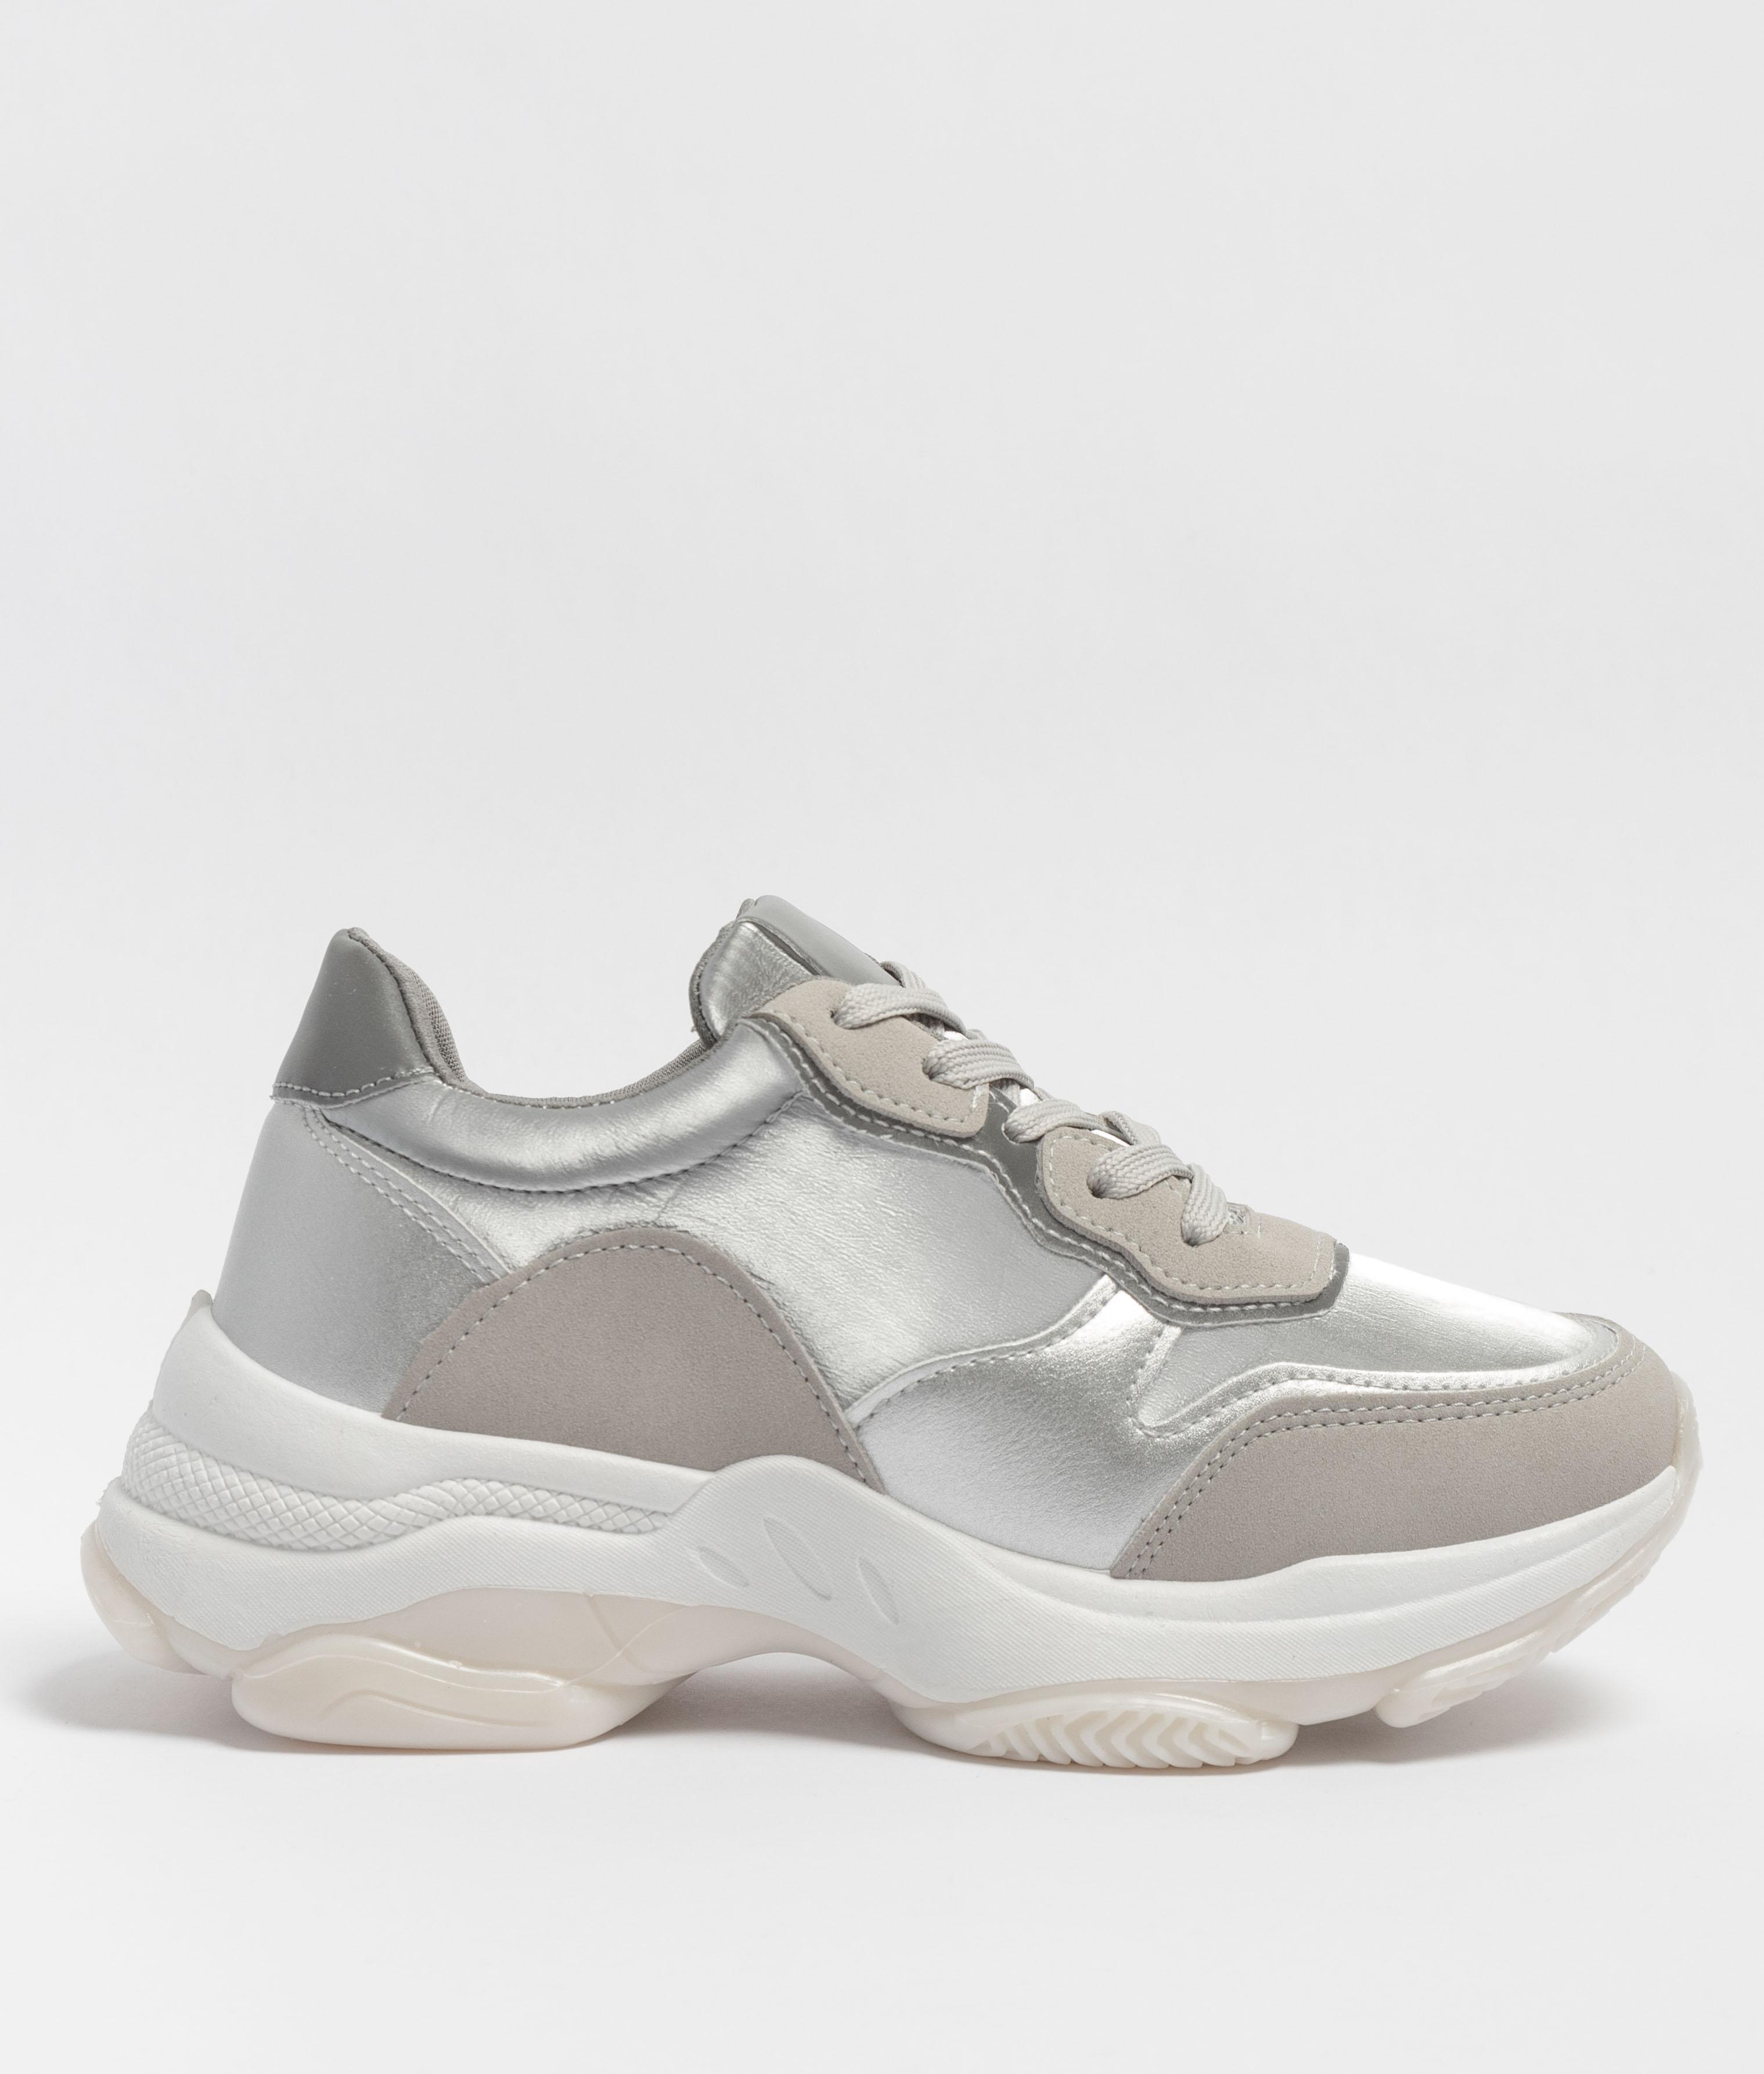 Sneakers Versus - Plata